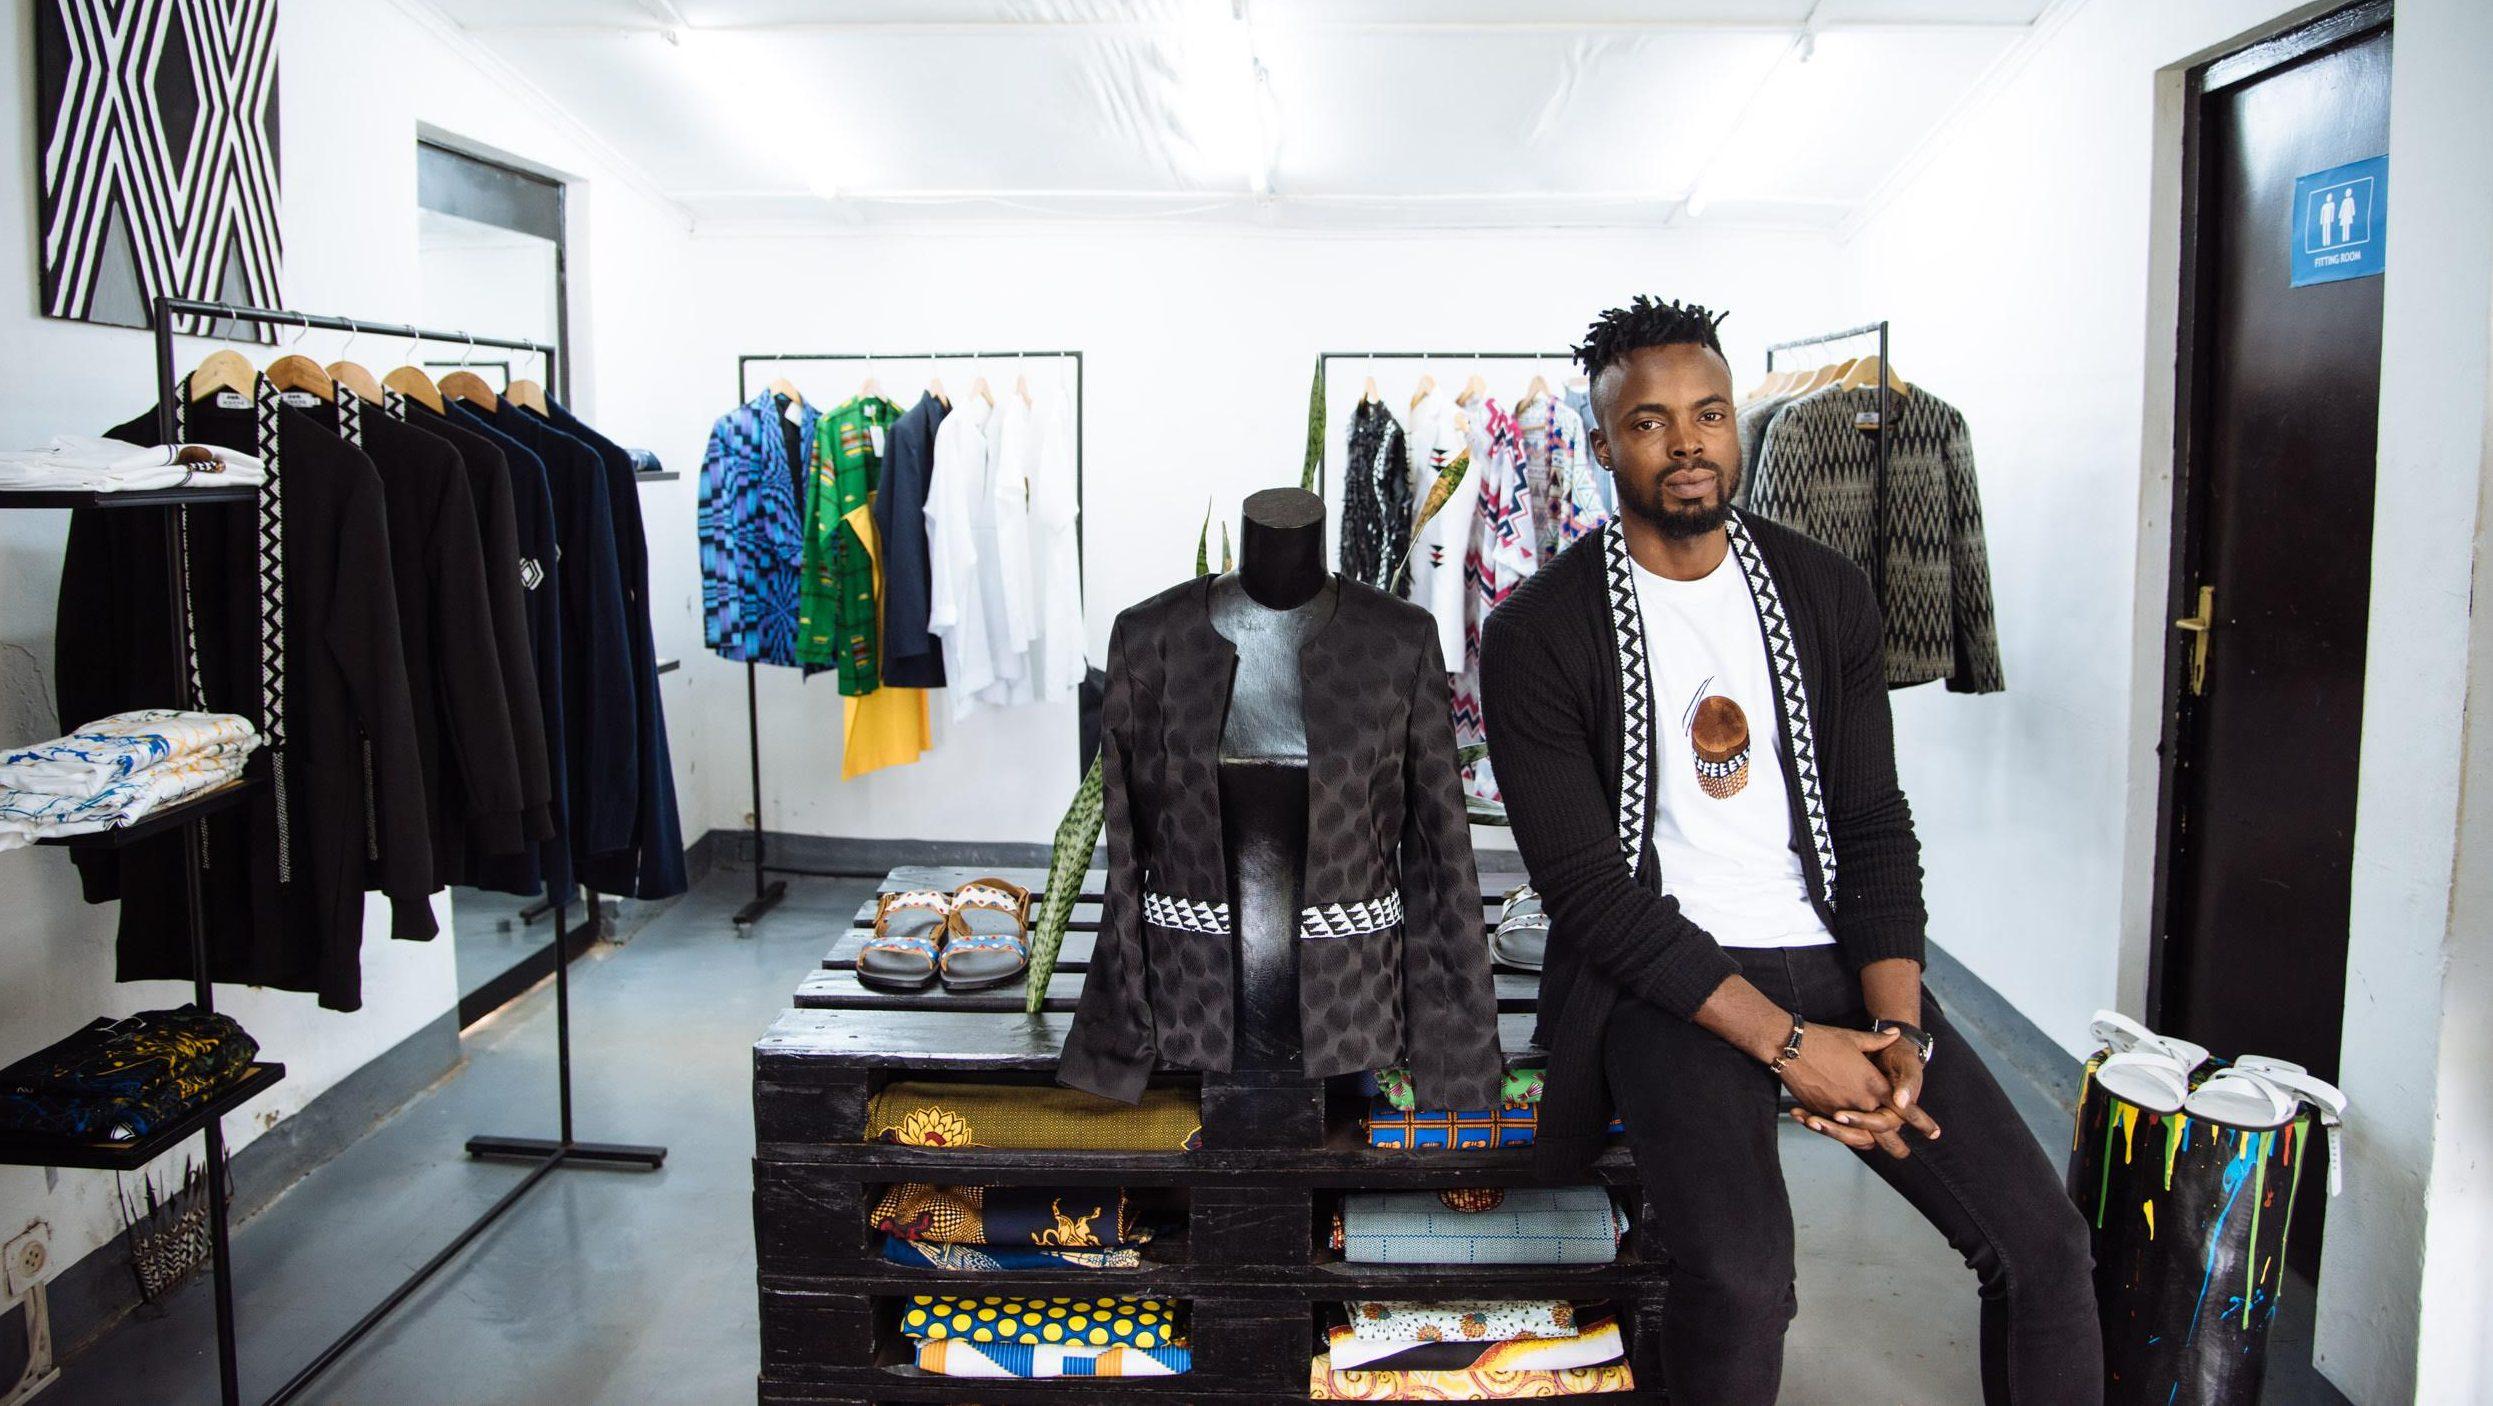 Moses Turahirwa Moshions